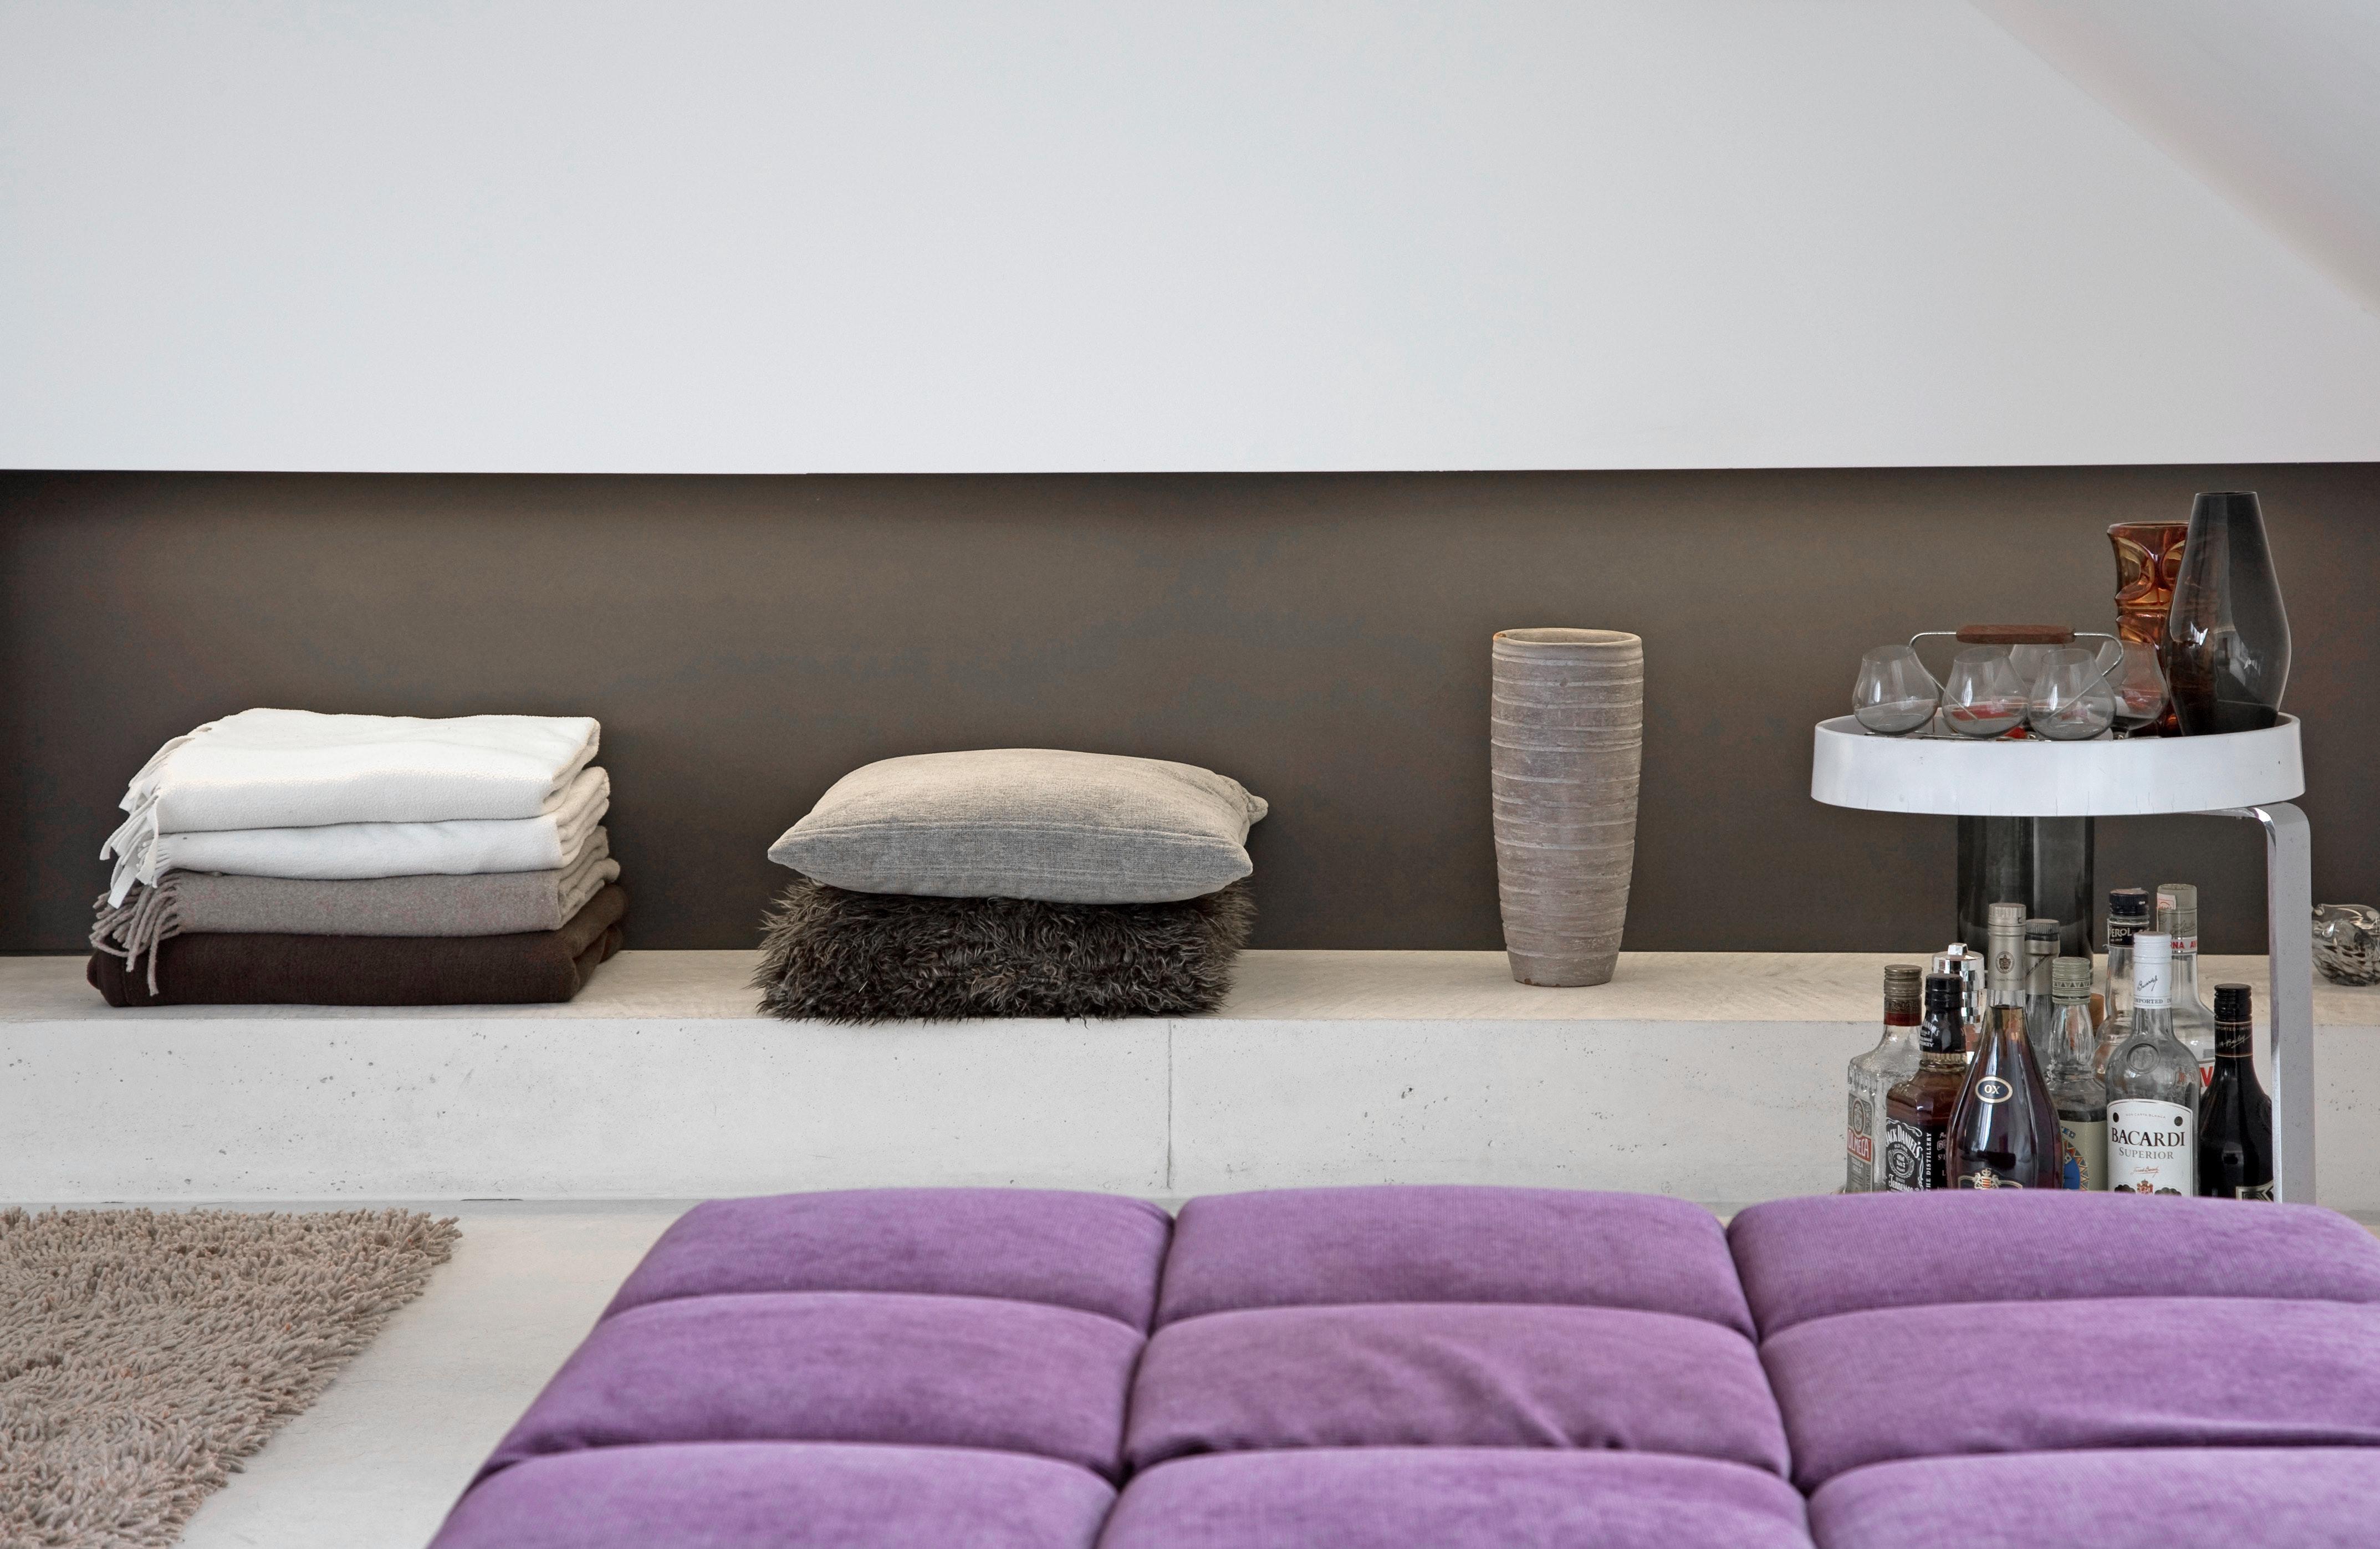 Elegant Elegant Emejing Hm Wohnung In Wien Design Destilat Ideas House Design  Designer With Hm Mbel With Hm Mbel With Mbel Bhm